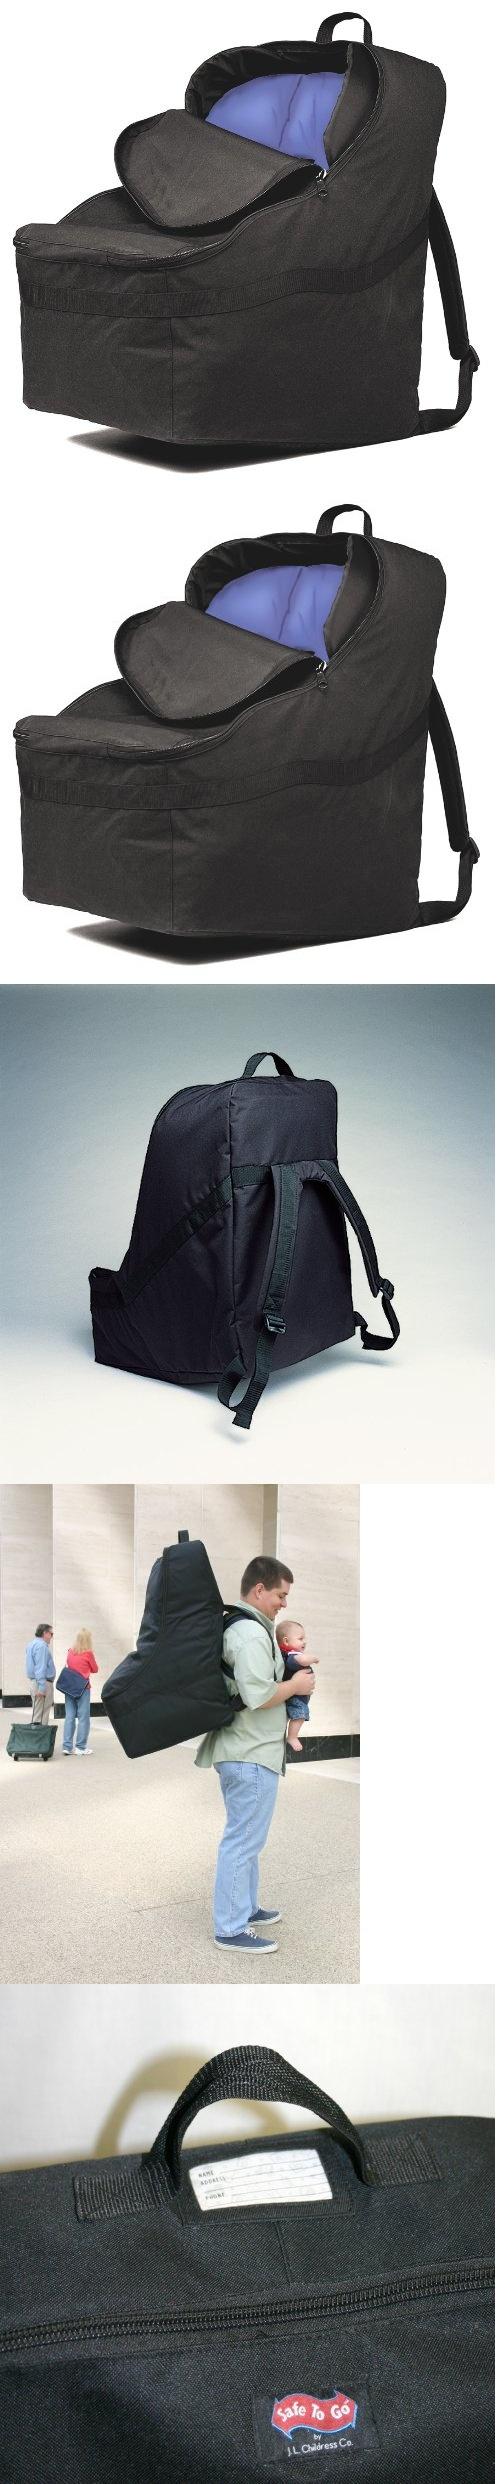 JL Childress Ultimate Car Seat Travel Bag Black